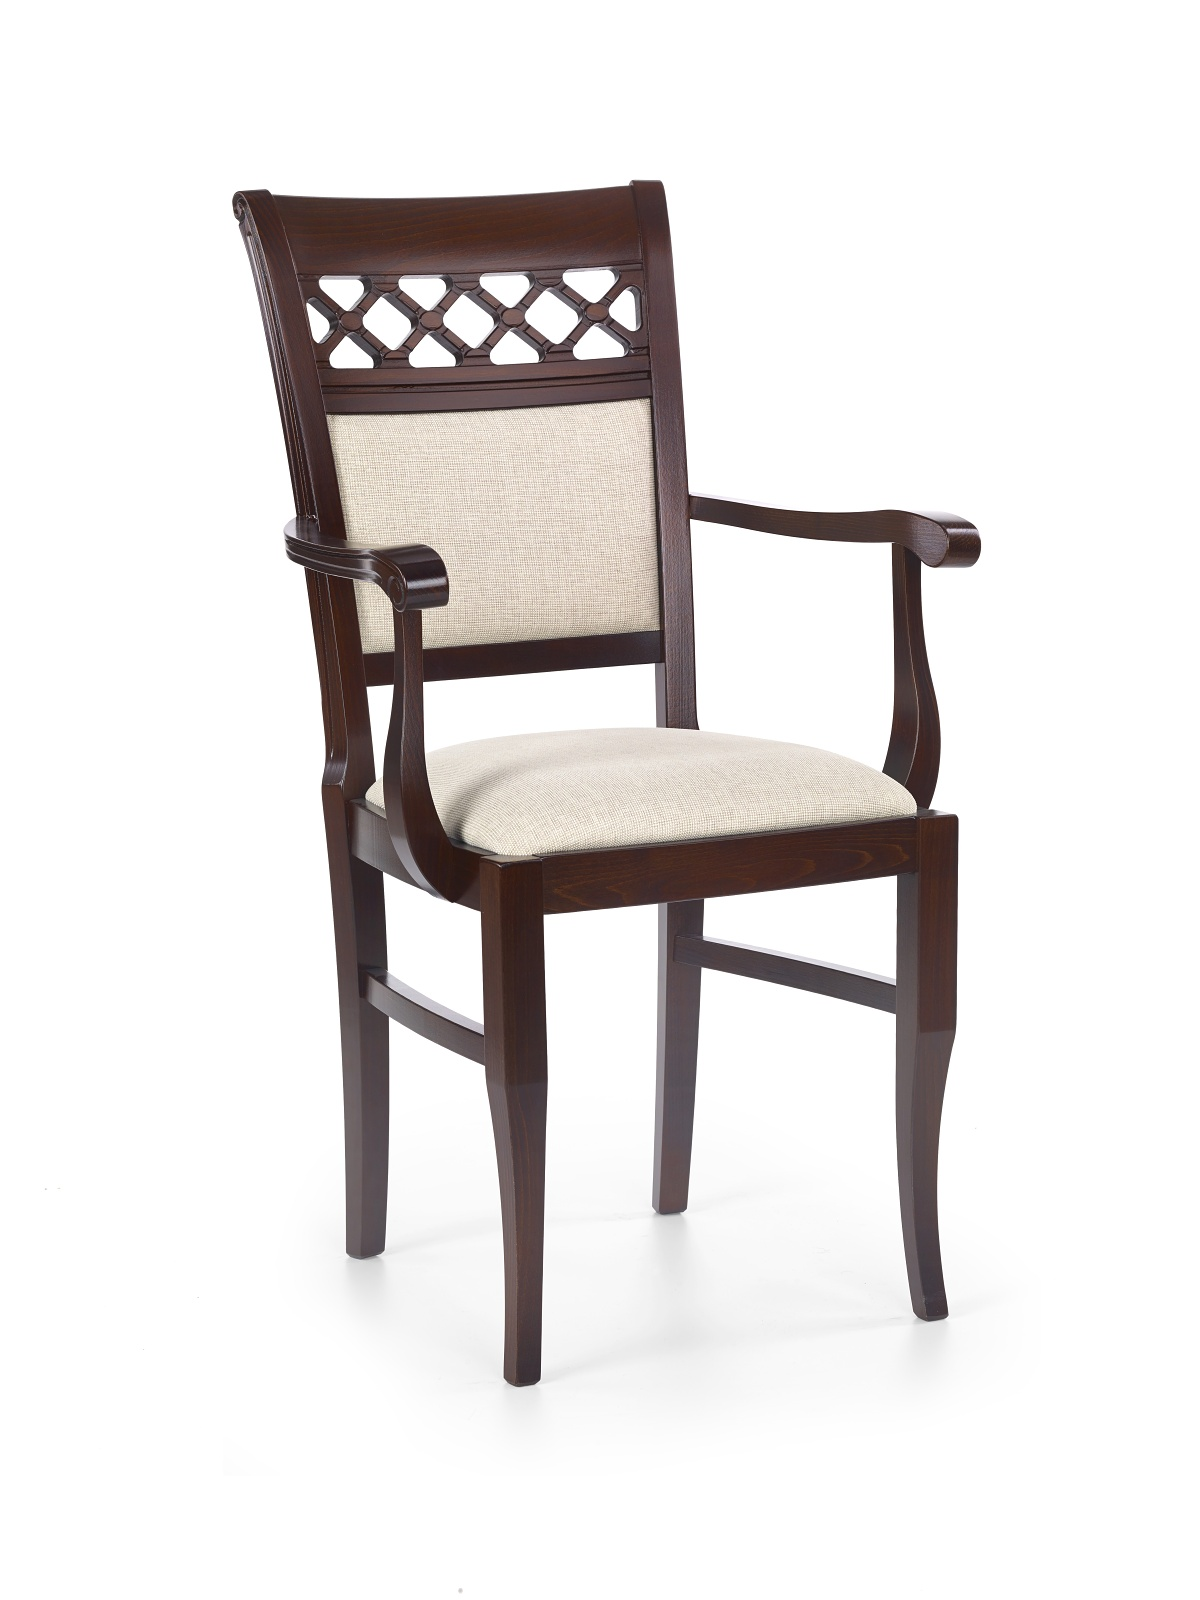 Jedálenská stolička - Halmar - Sebastian 3 P Orech tmavý